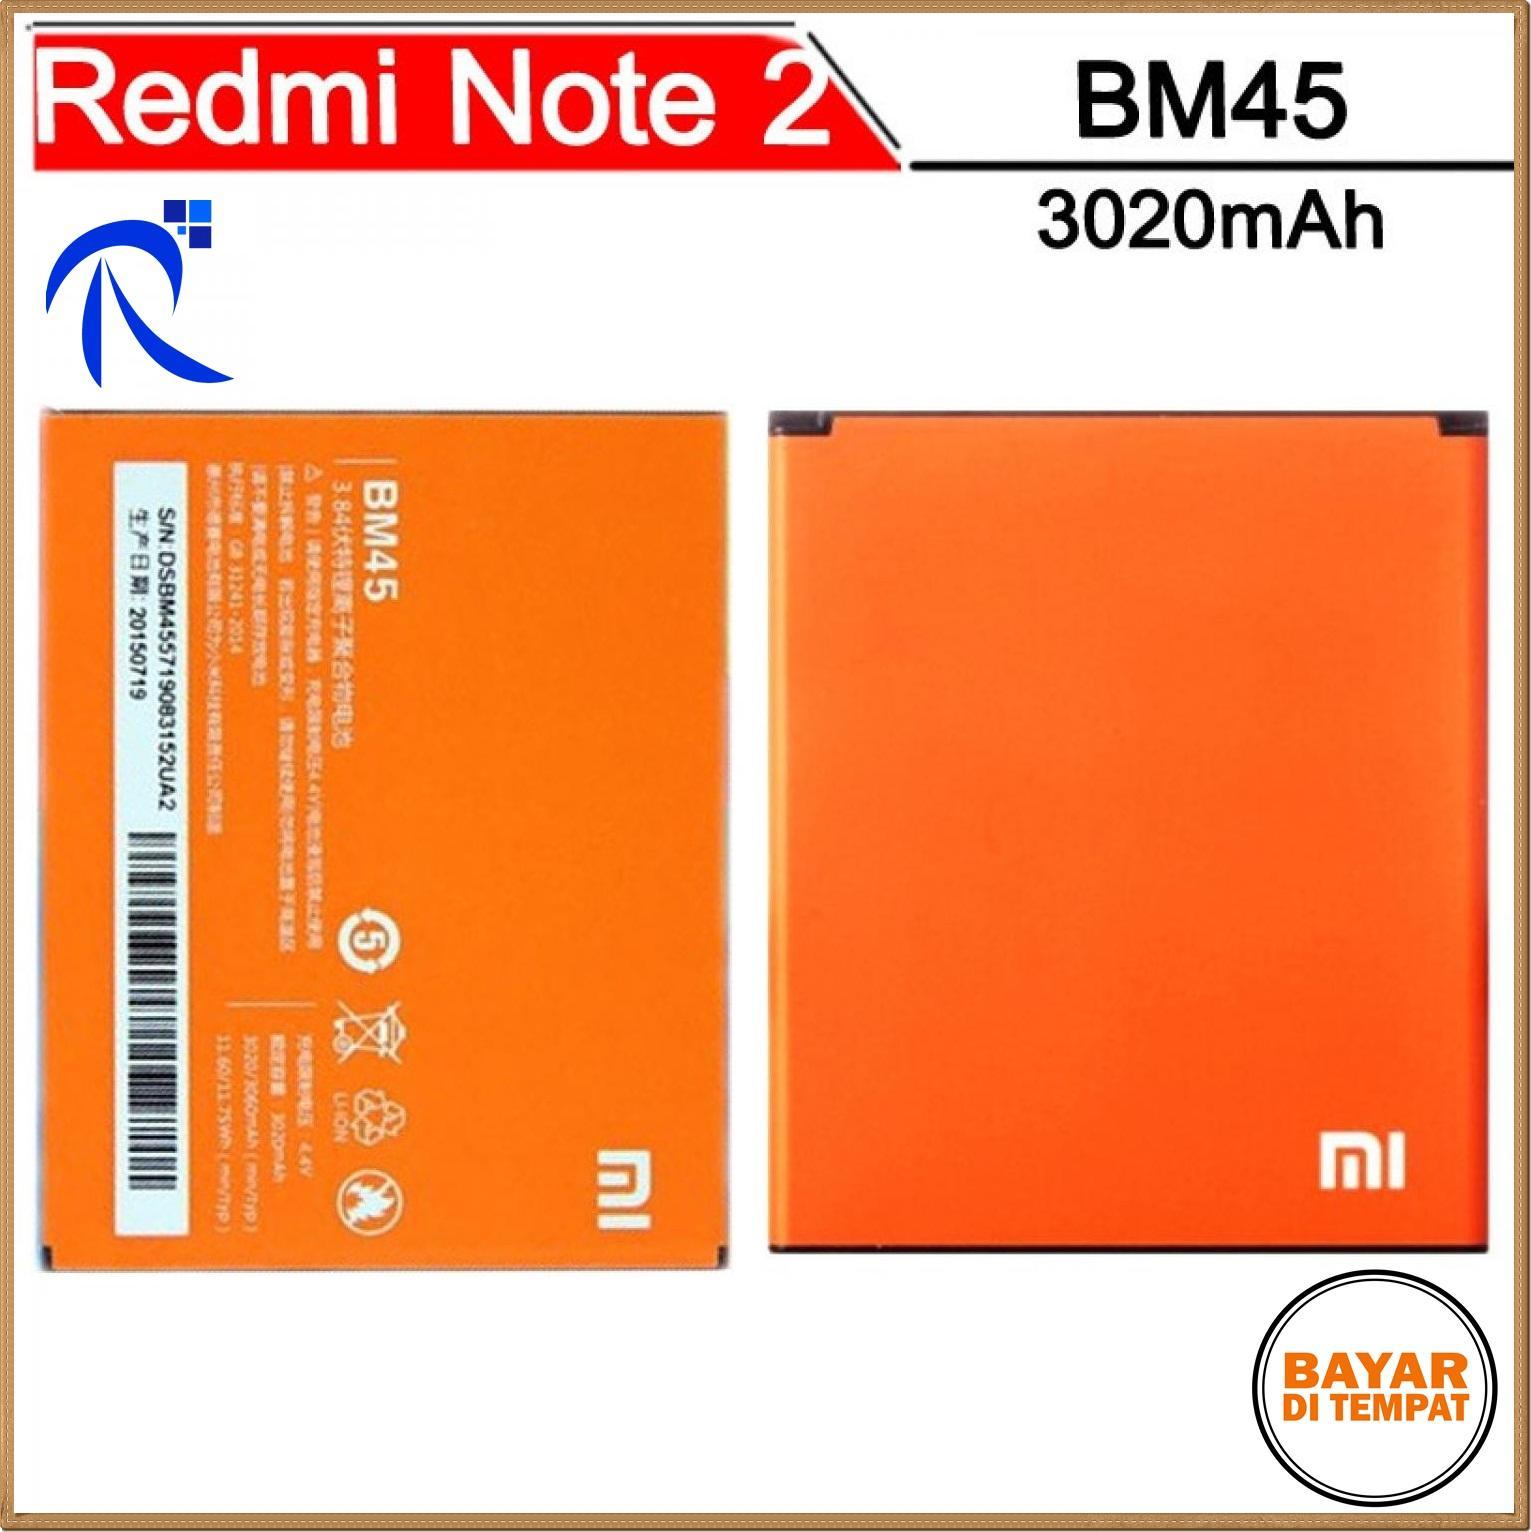 COD Baterai Xiaomi Redmi Note 2 3020mAh - BM45 (OEM) - Oranye / Orange